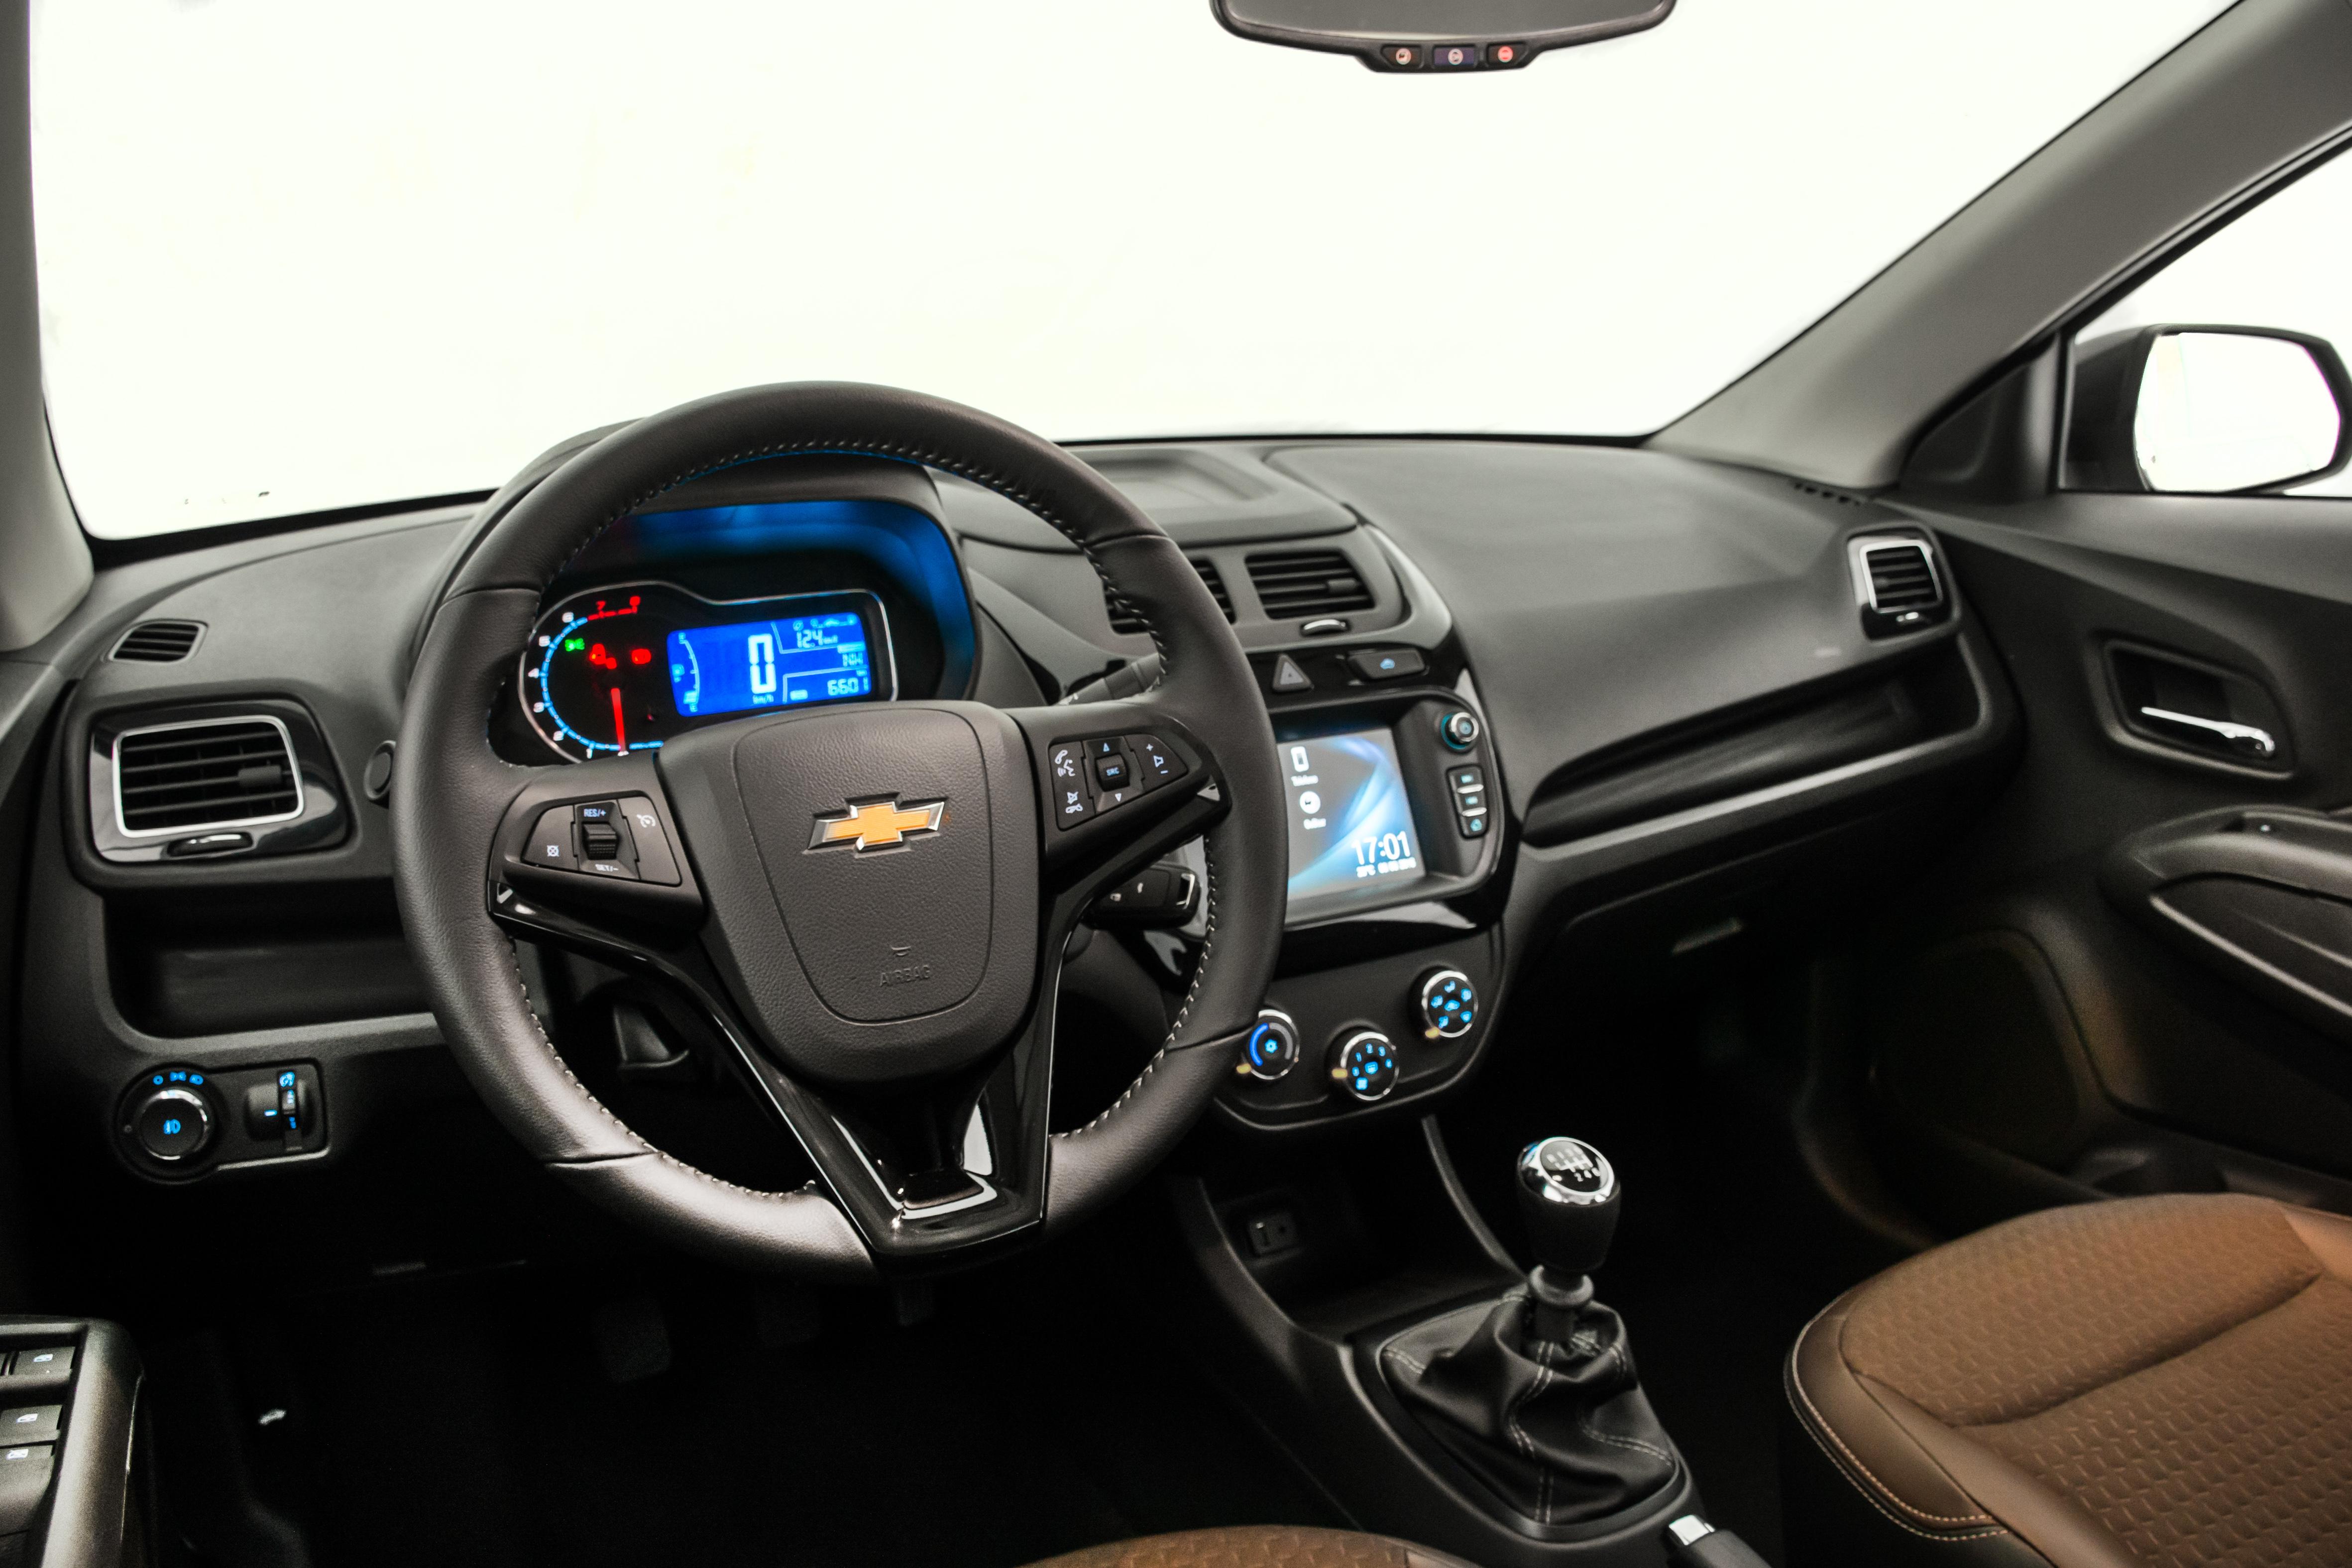 Chevrolet Cobalt LTZ 2017